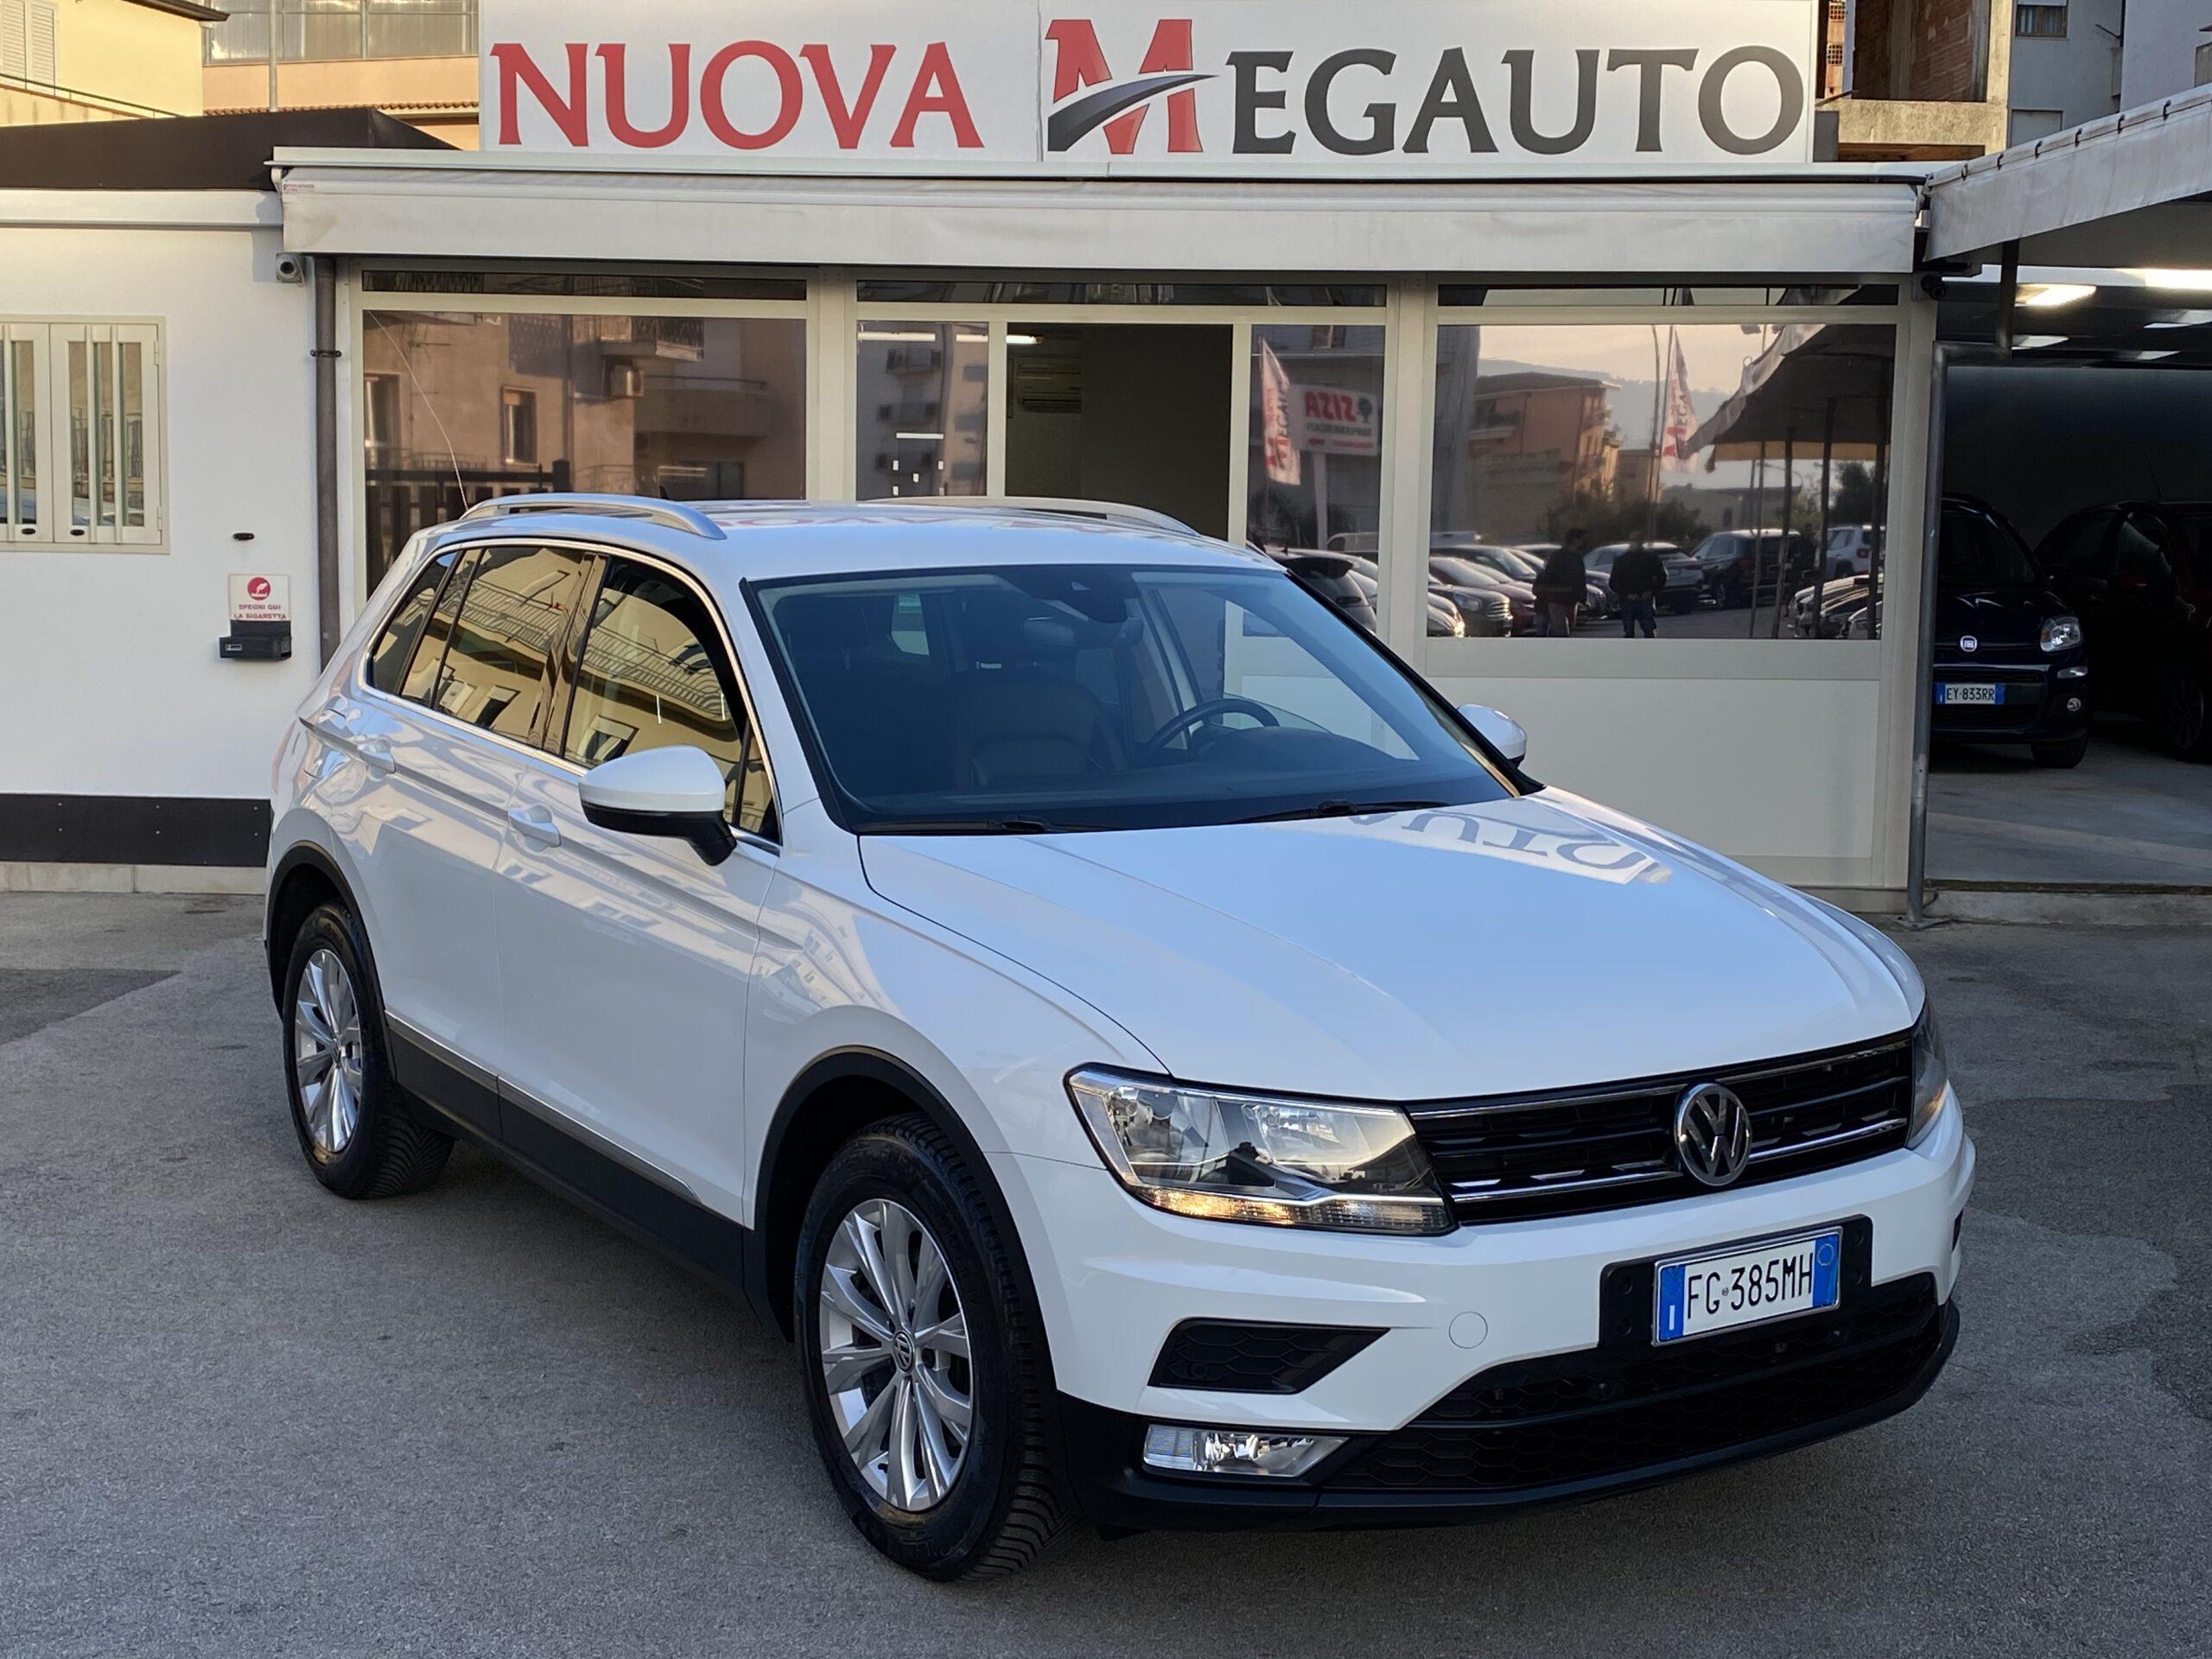 Volkswagen Tiguan 2.0 TDI SCR DSG Executive BlueMotion Technology 2017